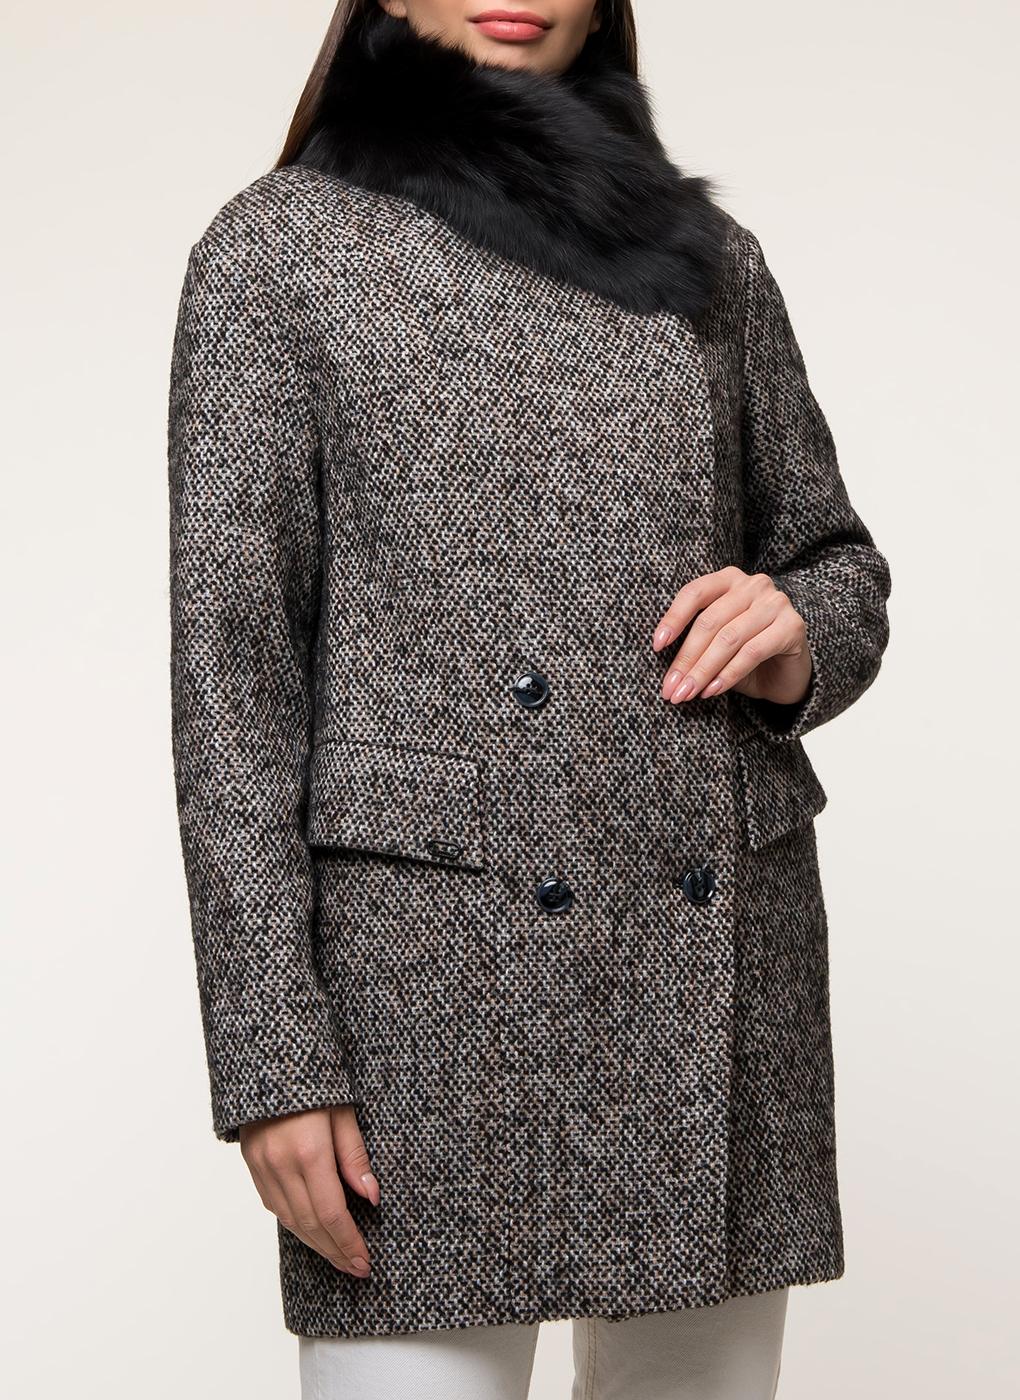 Пальто шерстяное 73, ElectraStyle фото